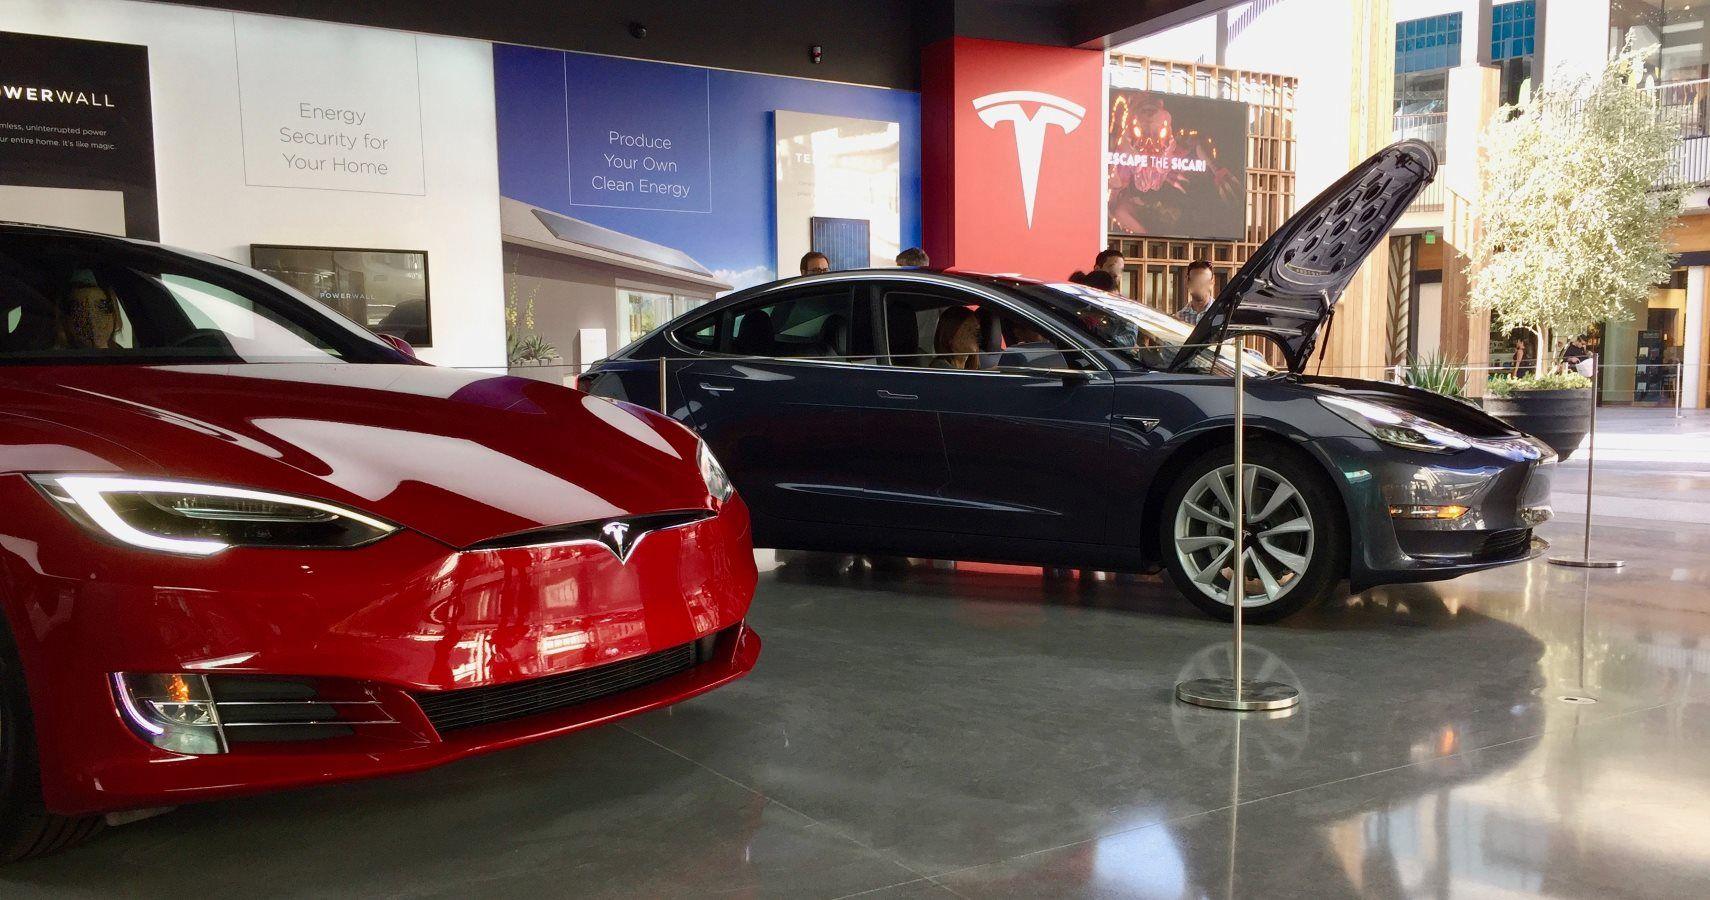 Rumor: Tesla Refunds High Number Of Model 3 Reservations